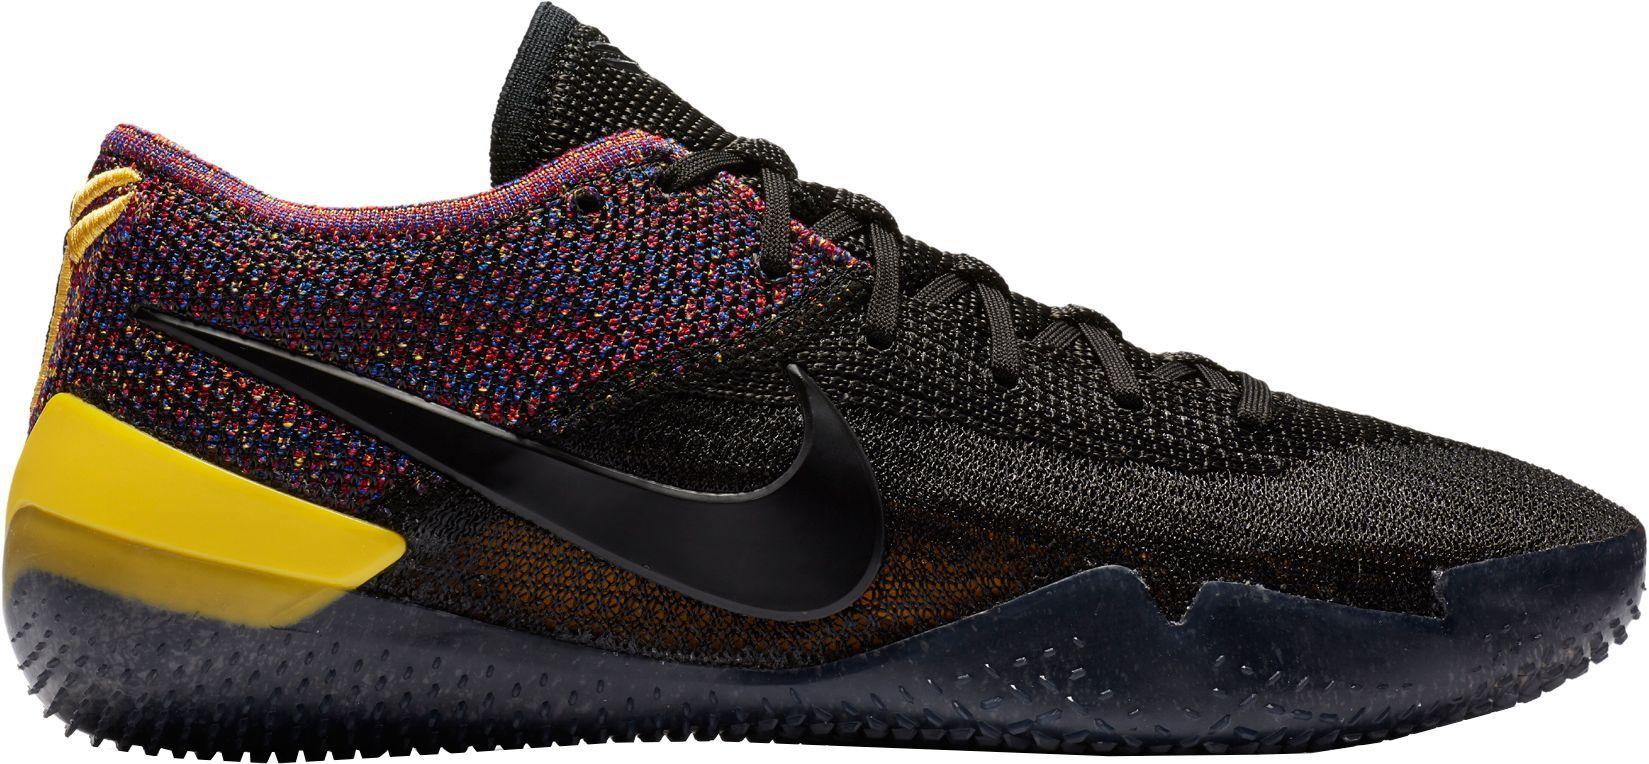 separation shoes 3e49d 24963 Nike Kobe A.D. NXT 360 Basketball Shoes | Products | Nike ...